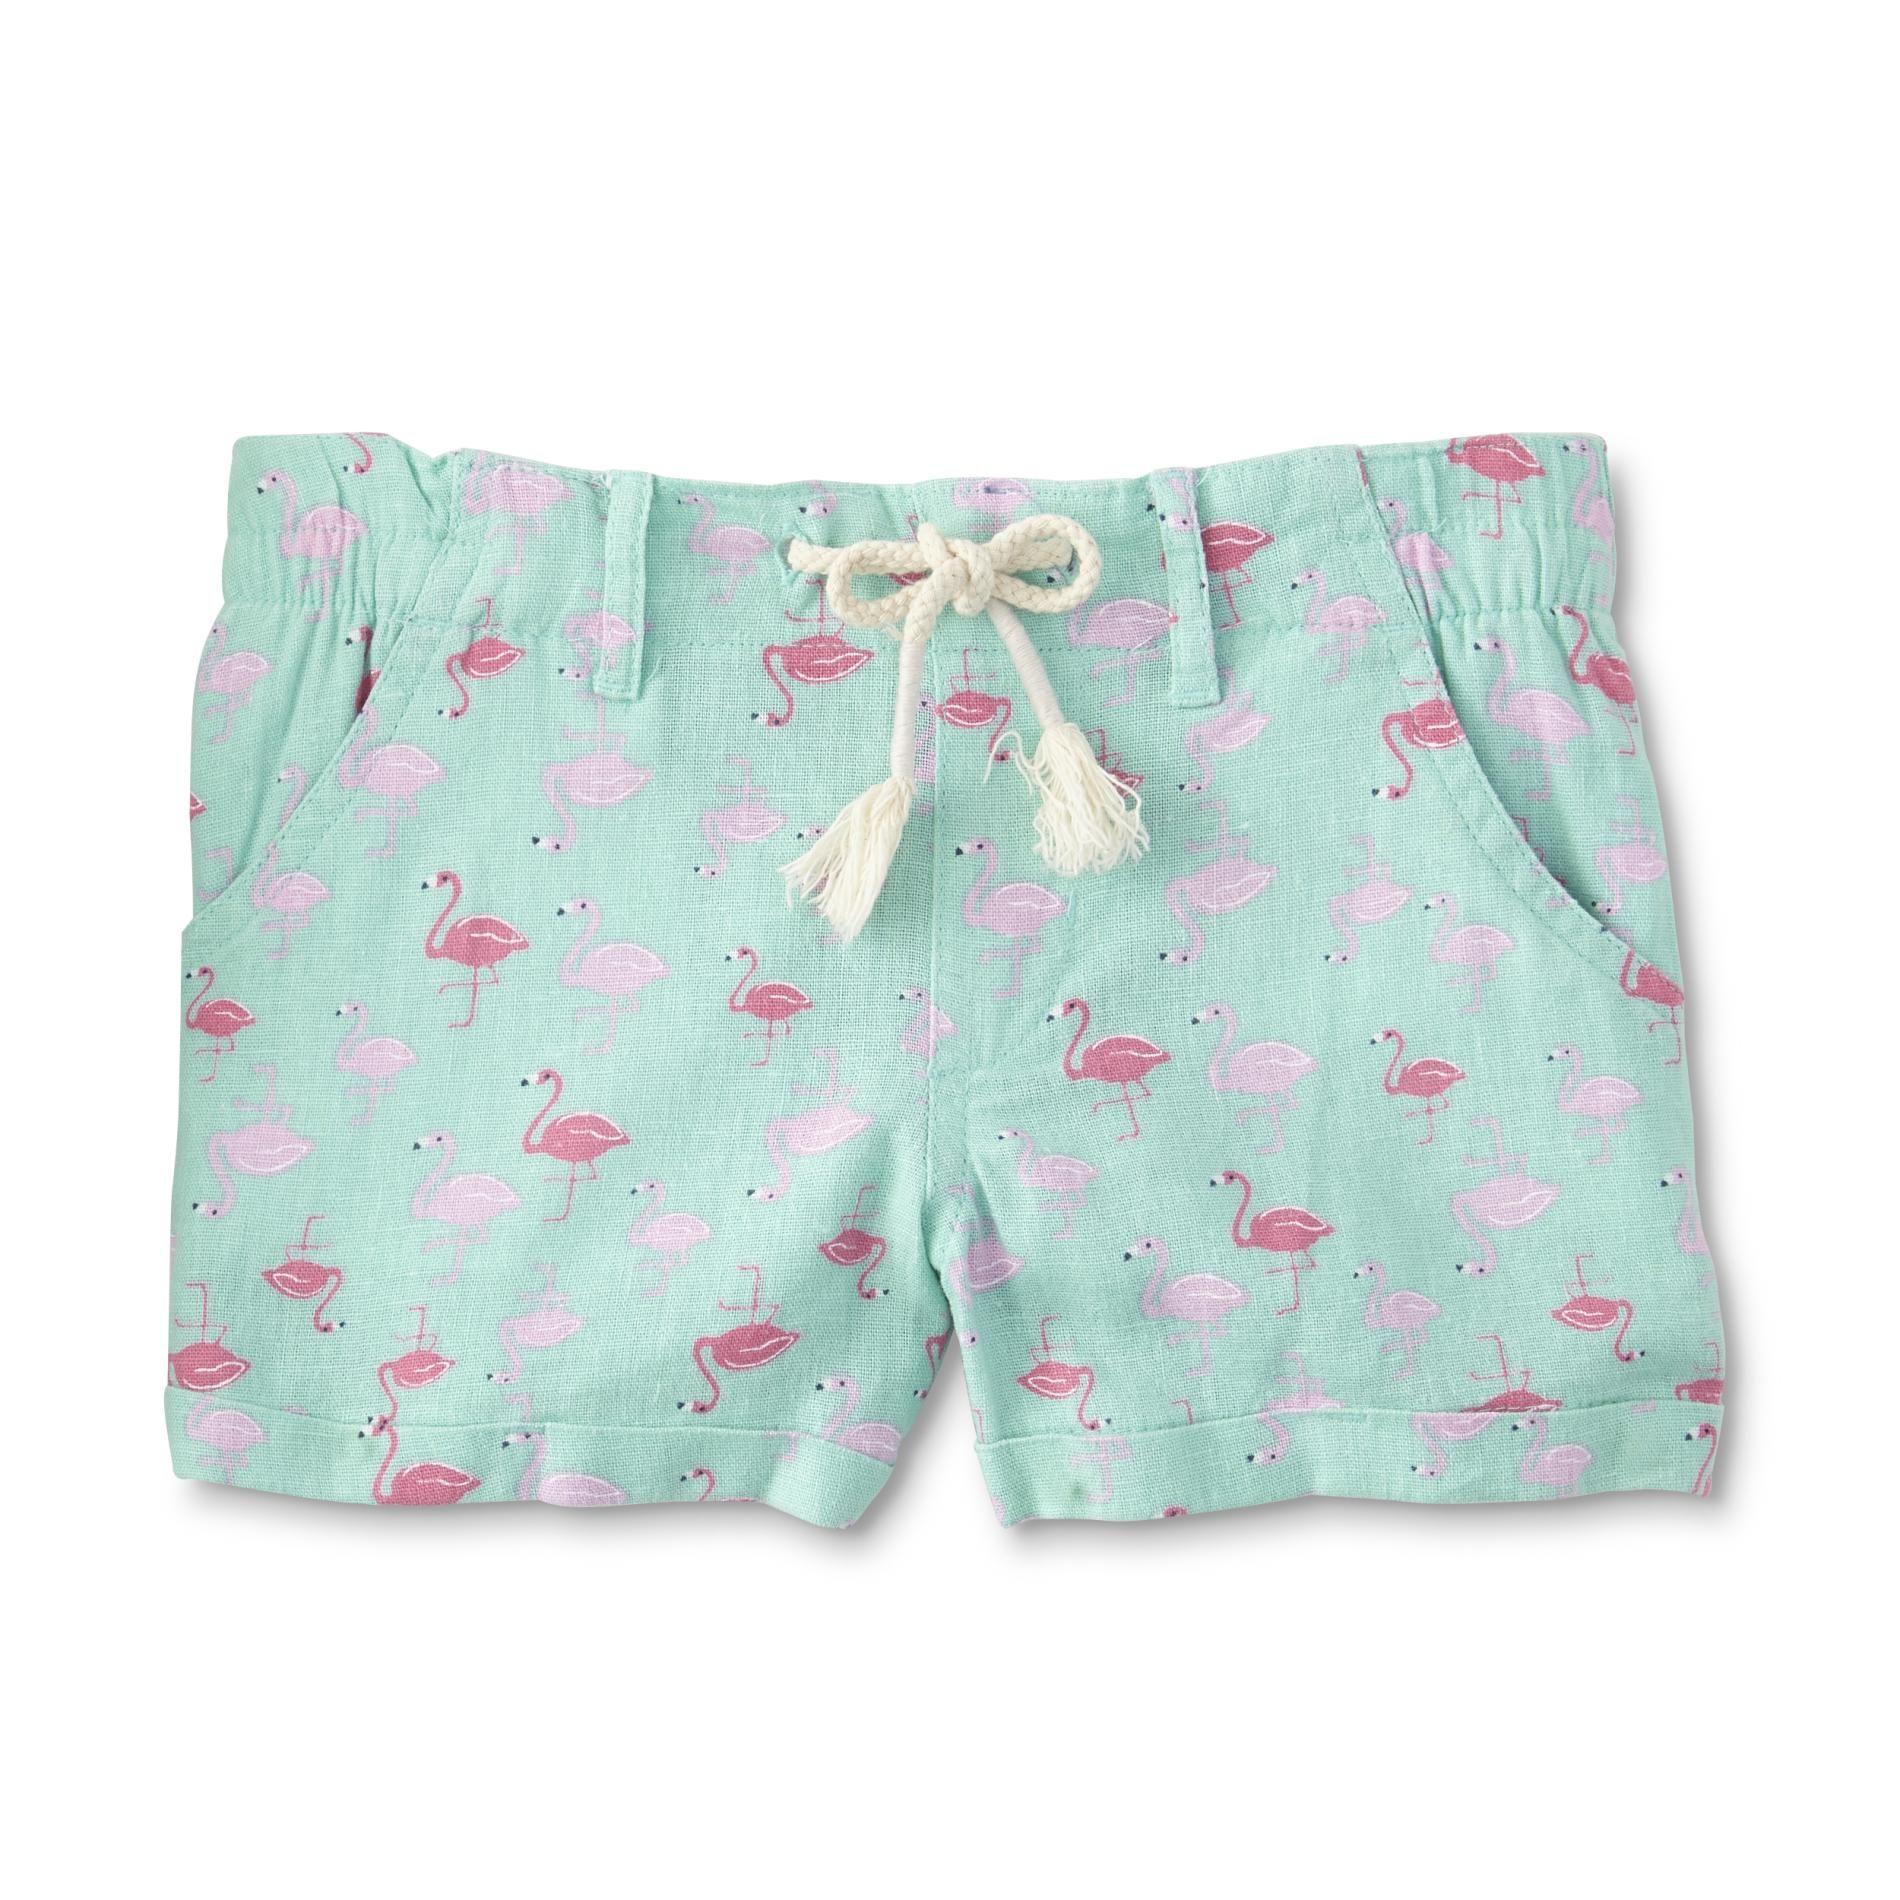 d2c0aea99c Kmart - Basic Editions Girls' Shorts - Flamingos |